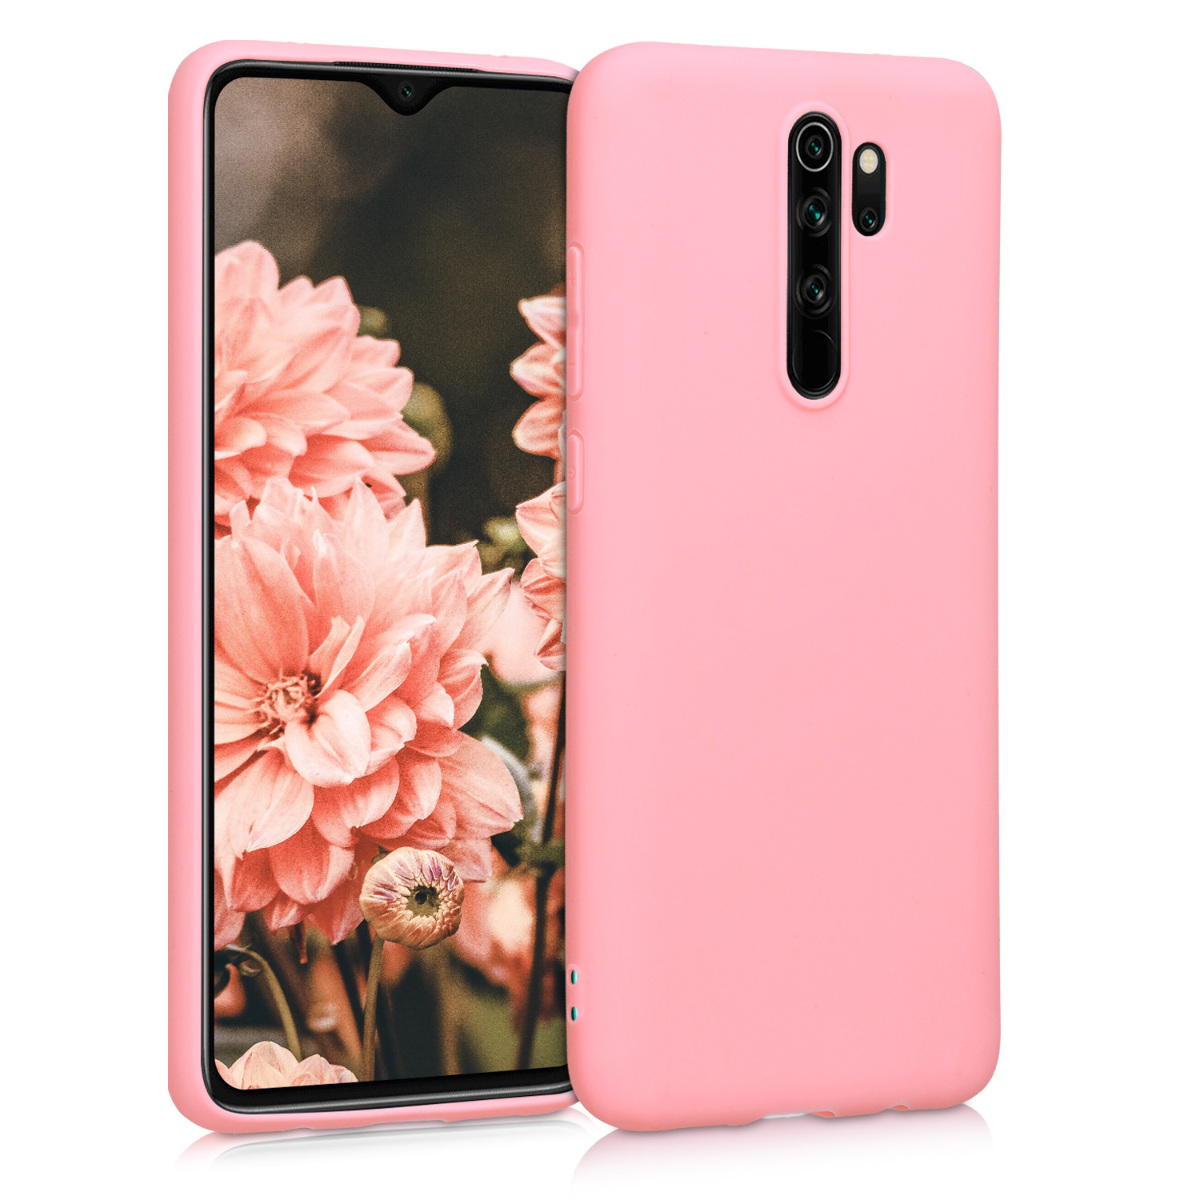 KW Θήκη Σιλικόνης Xiaomi Redmi Note 8 Pro - Light Pink Matte (50242.123)